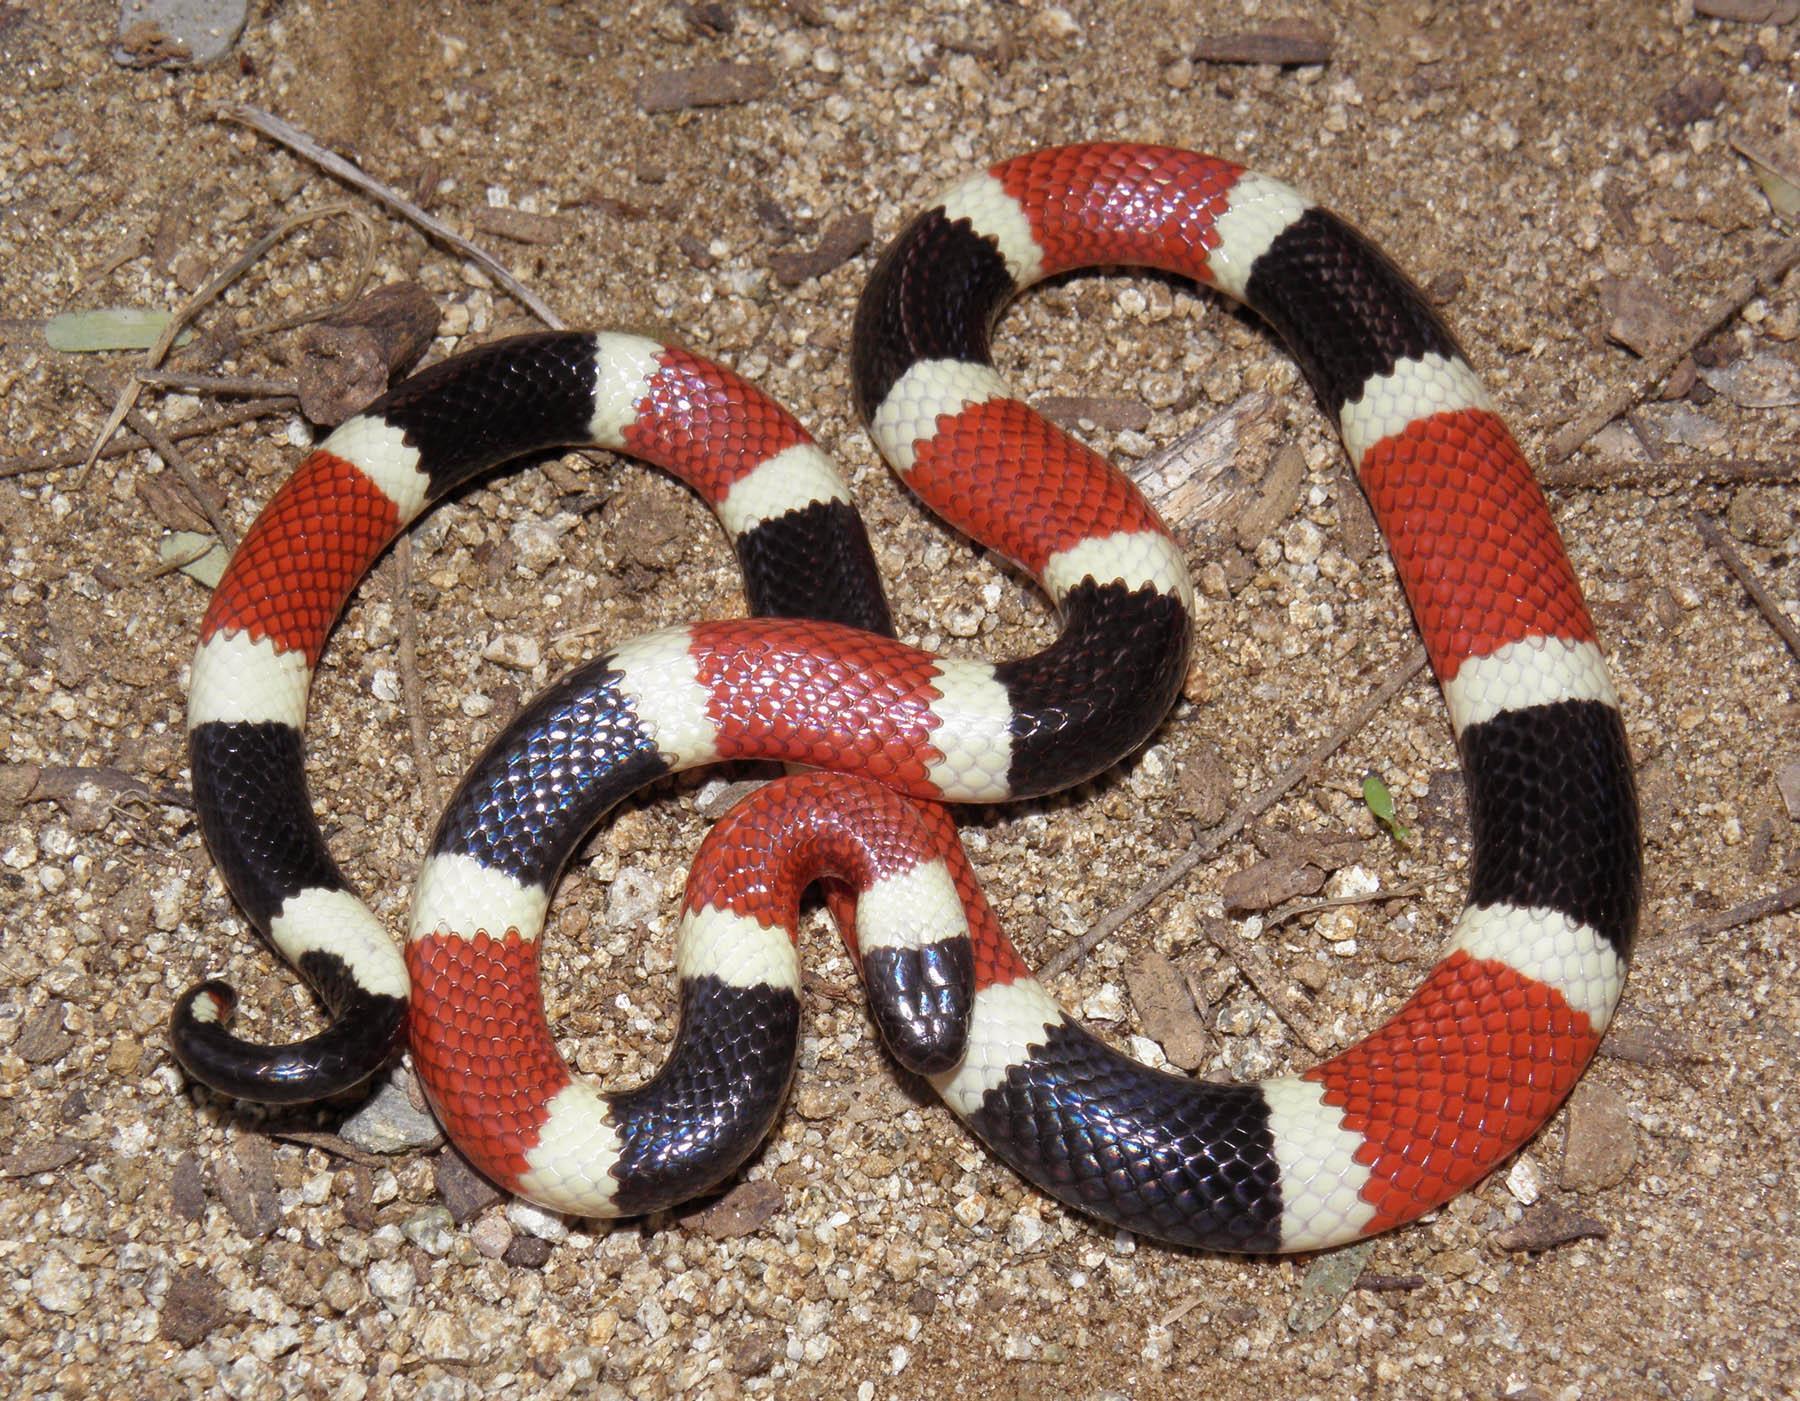 Drawn snake coral snake Download Snake #17 Coral Snake